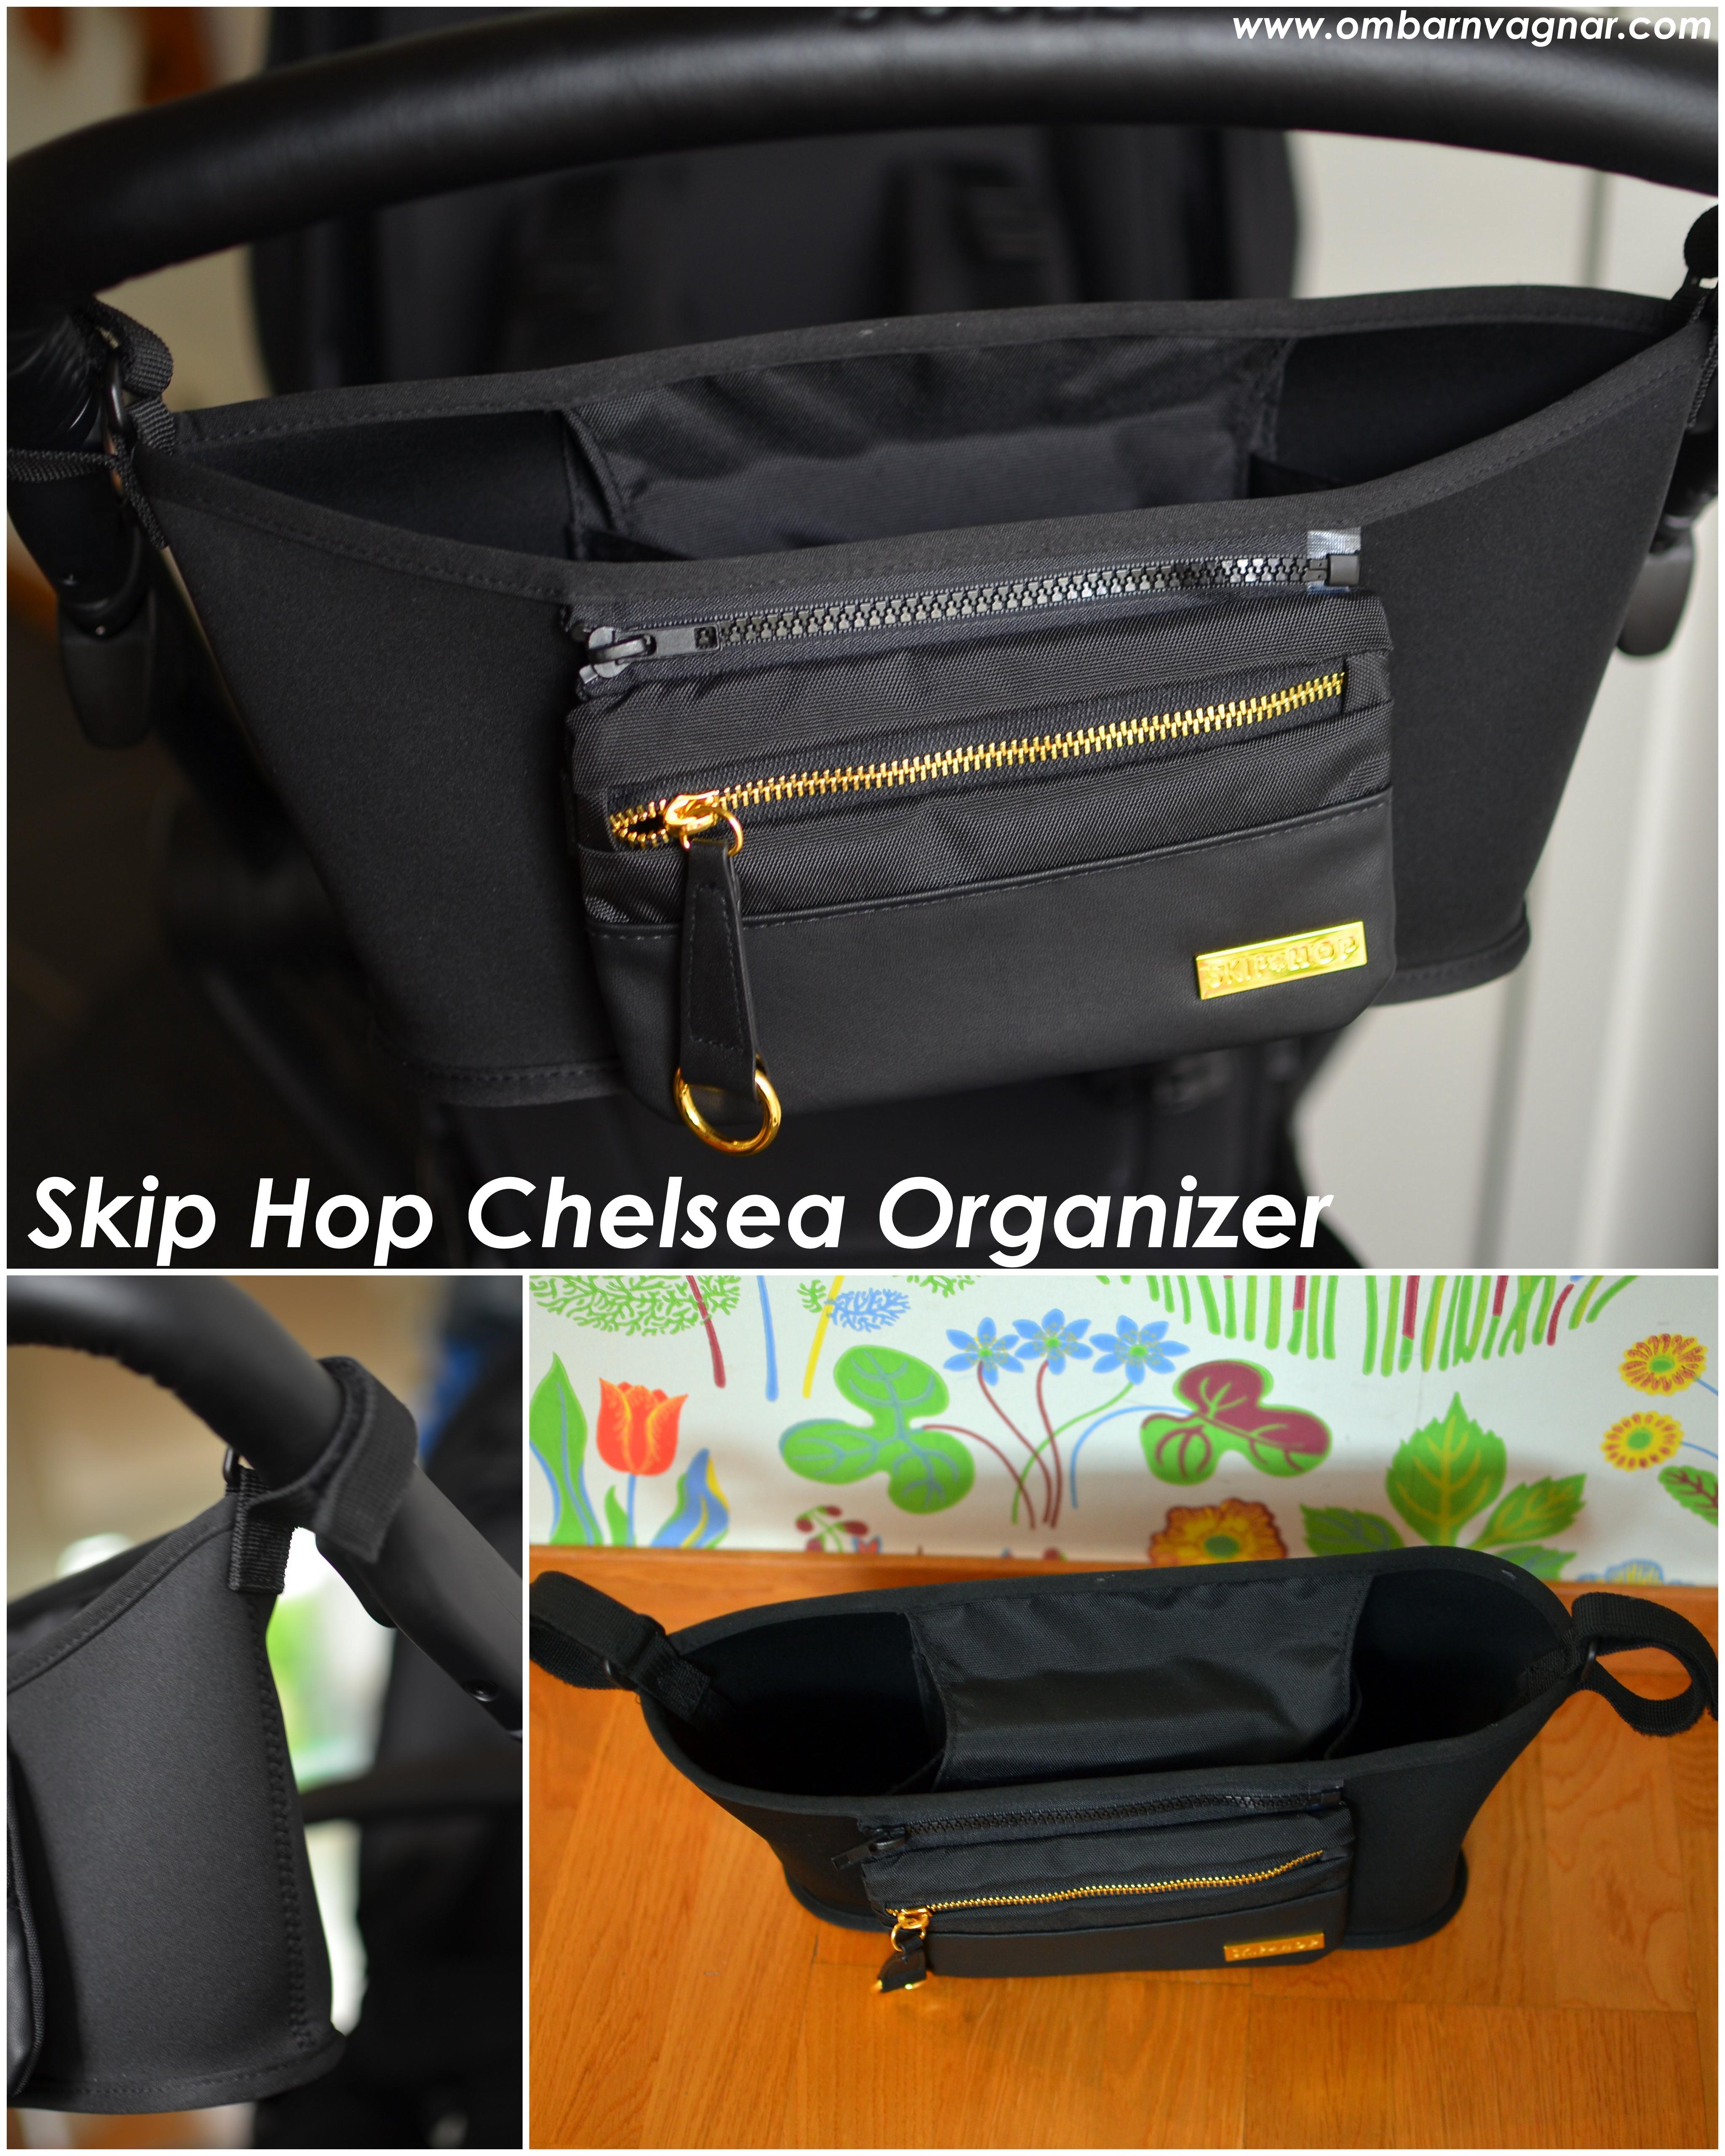 Recension av Skip Hop Chelsea Organizer